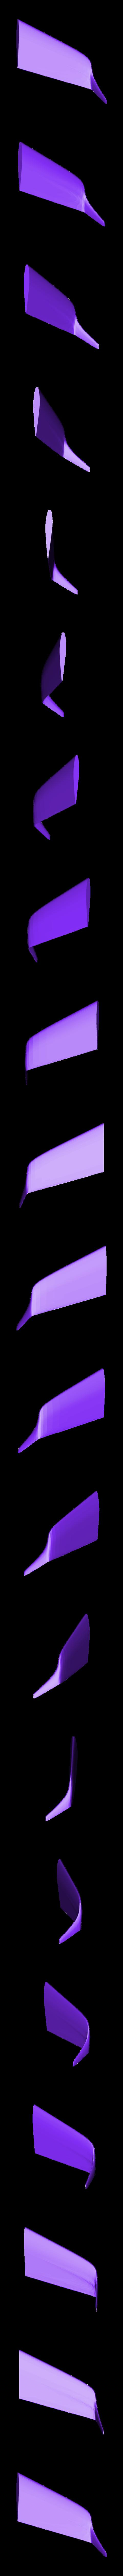 Wing3_R.STL Download STL file Phenom 300 • Template to 3D print, Eduardohbm